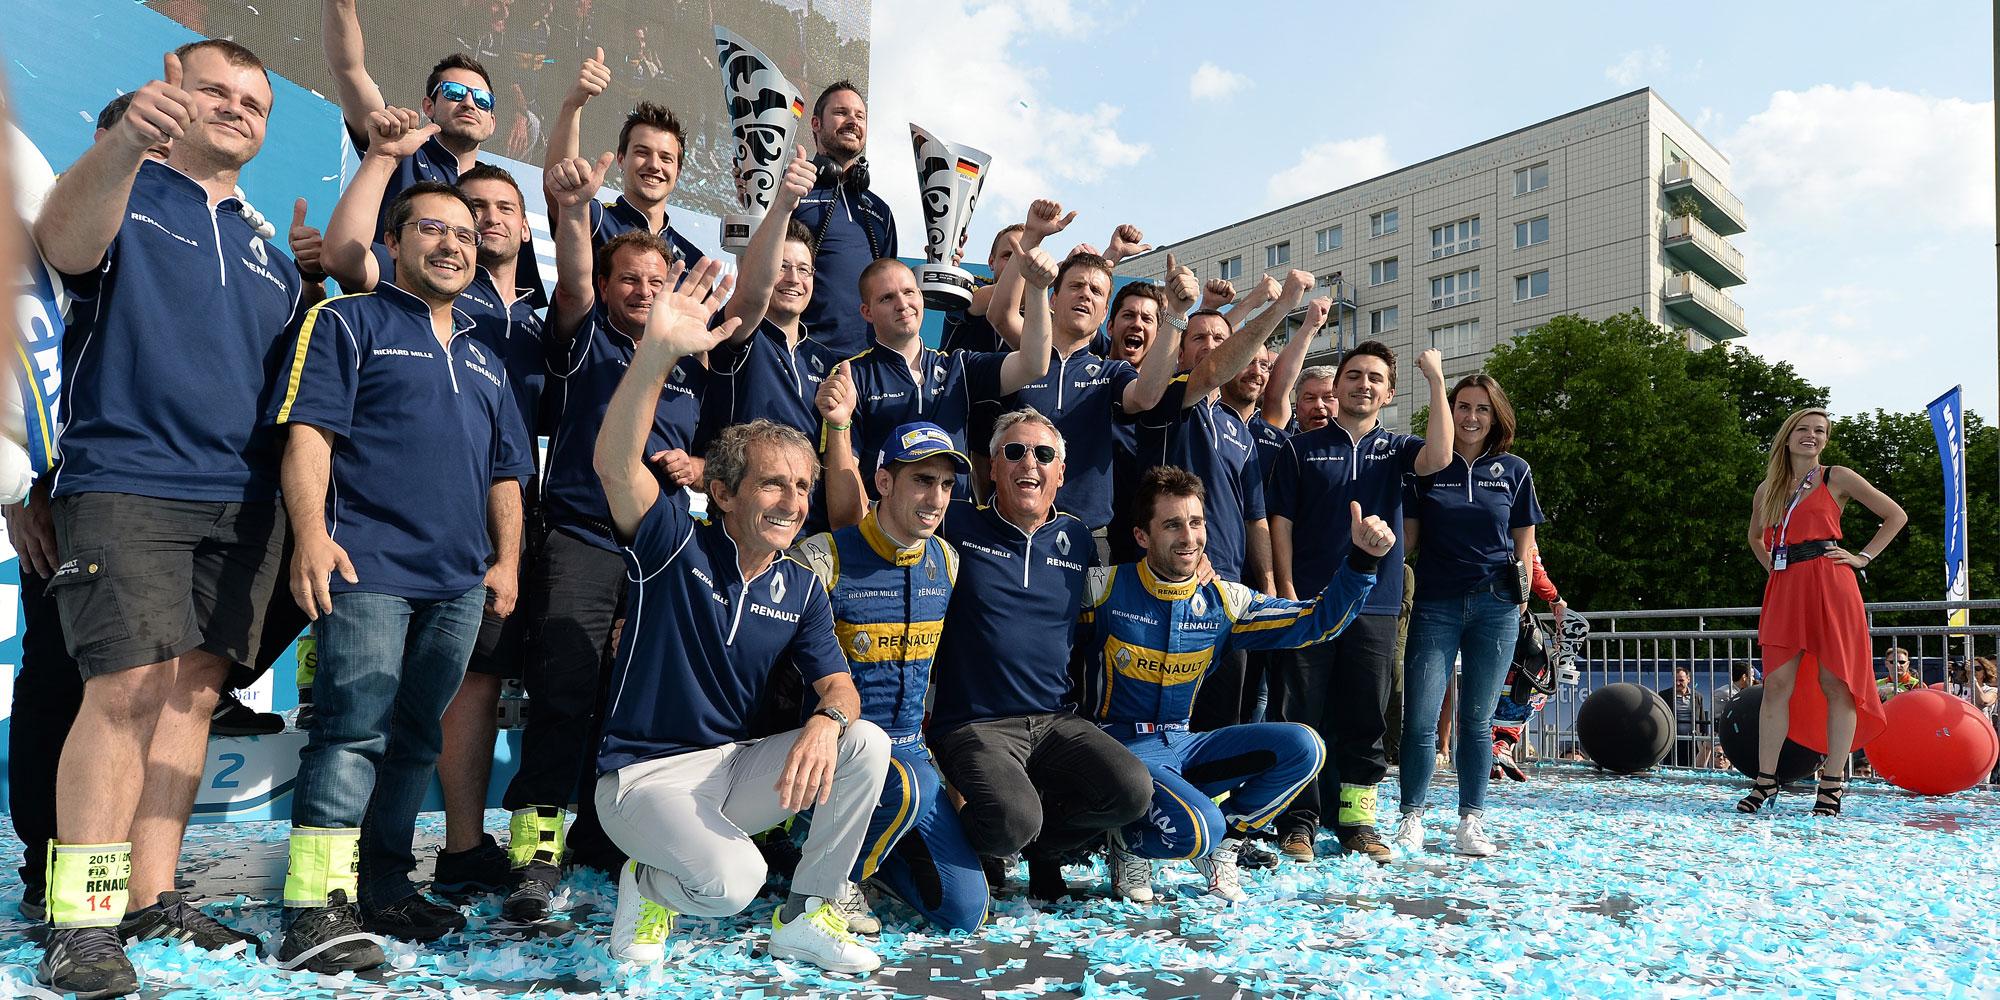 Team Formel e Sieg Berlin